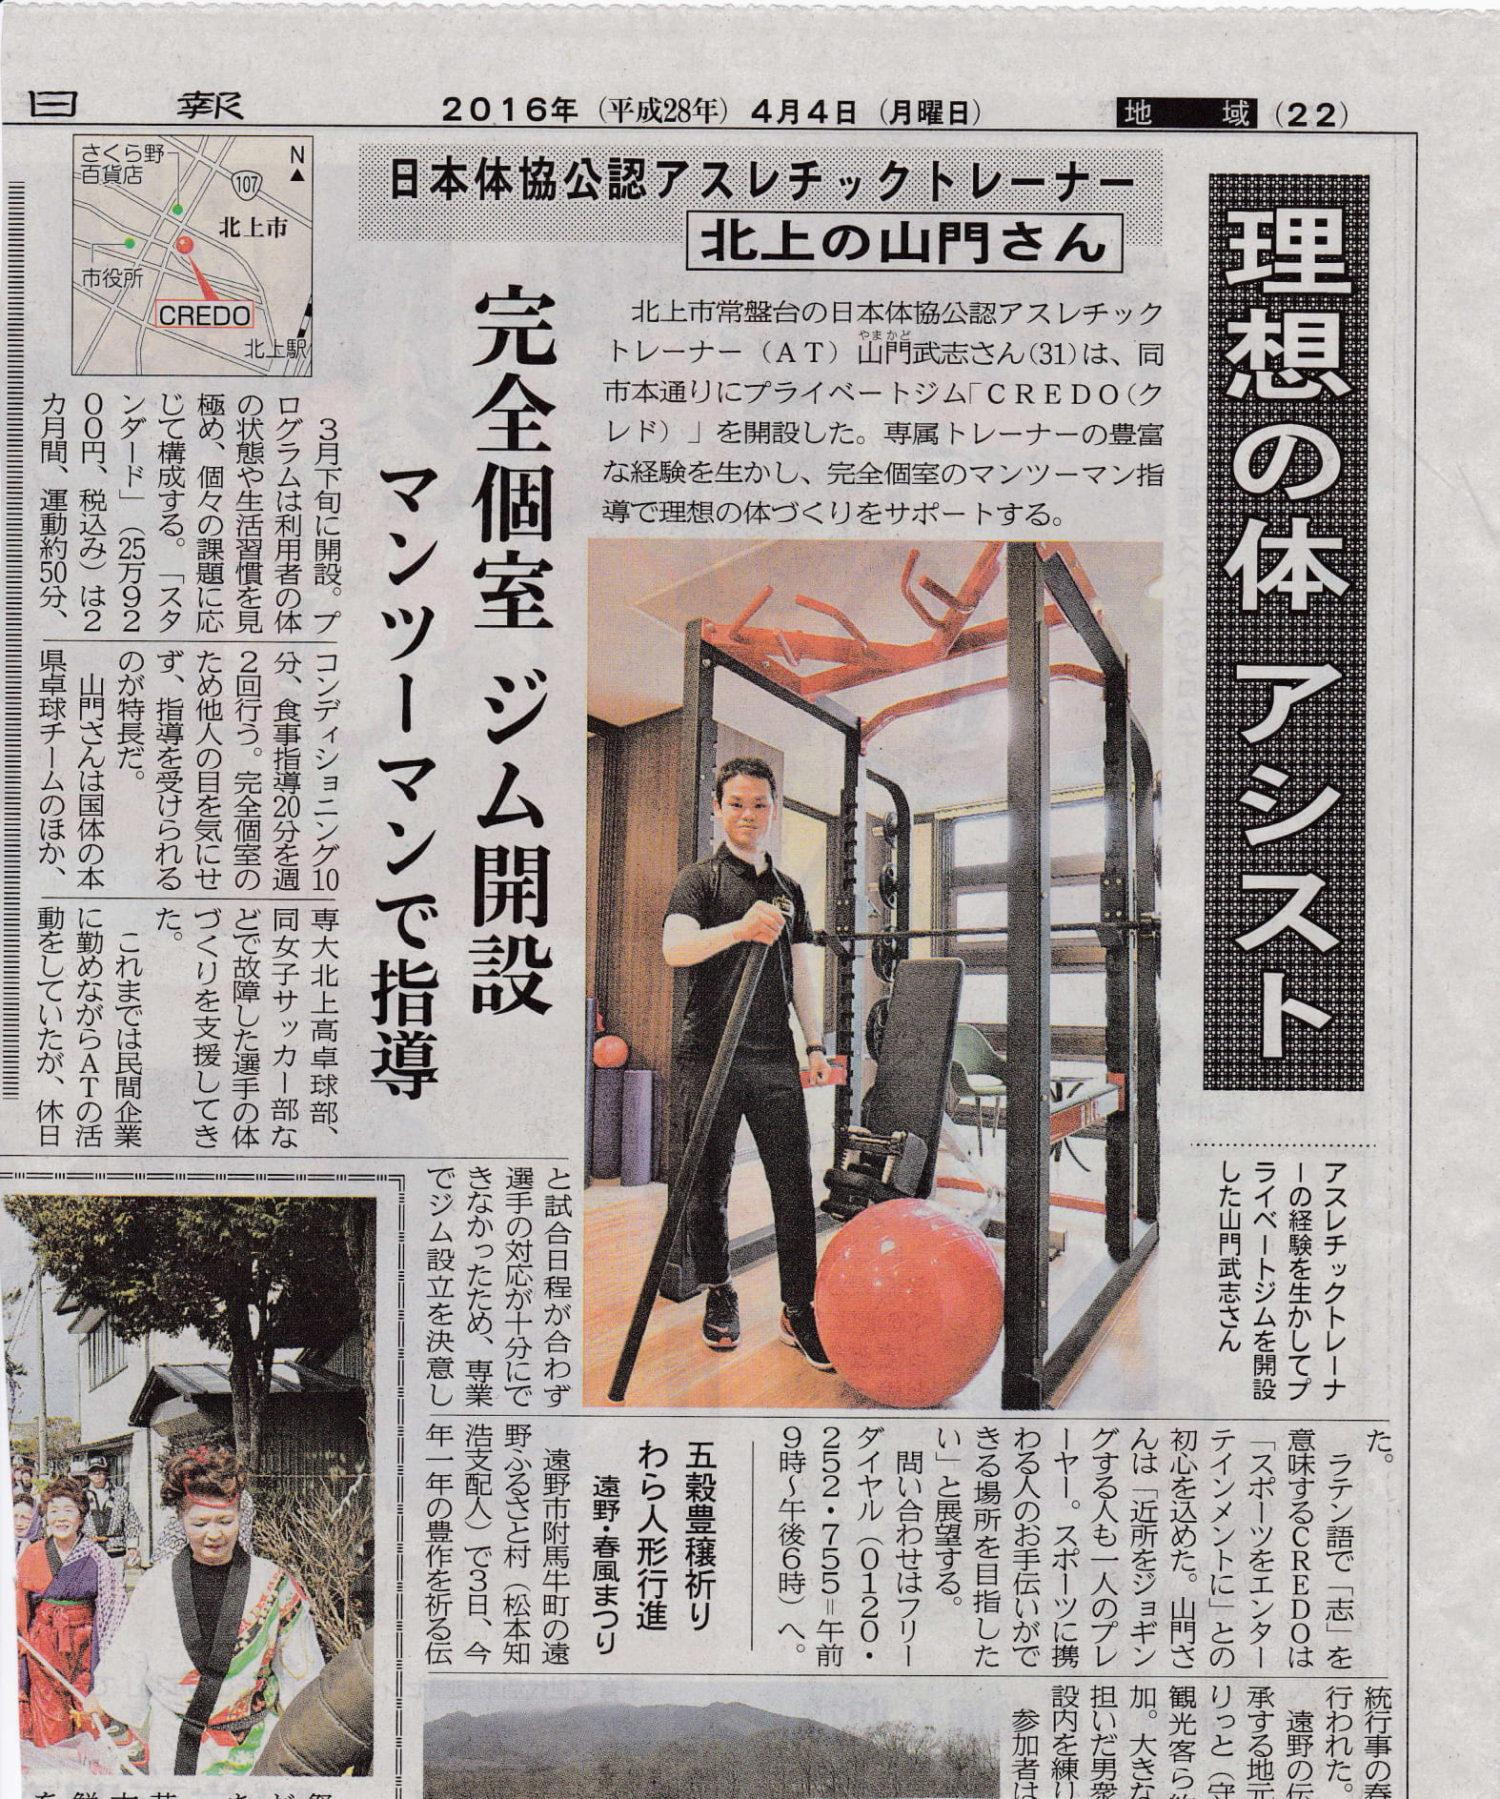 <p>平成28年4月4日岩手日報掲載<br/>【理想の体 アシスト】</p>